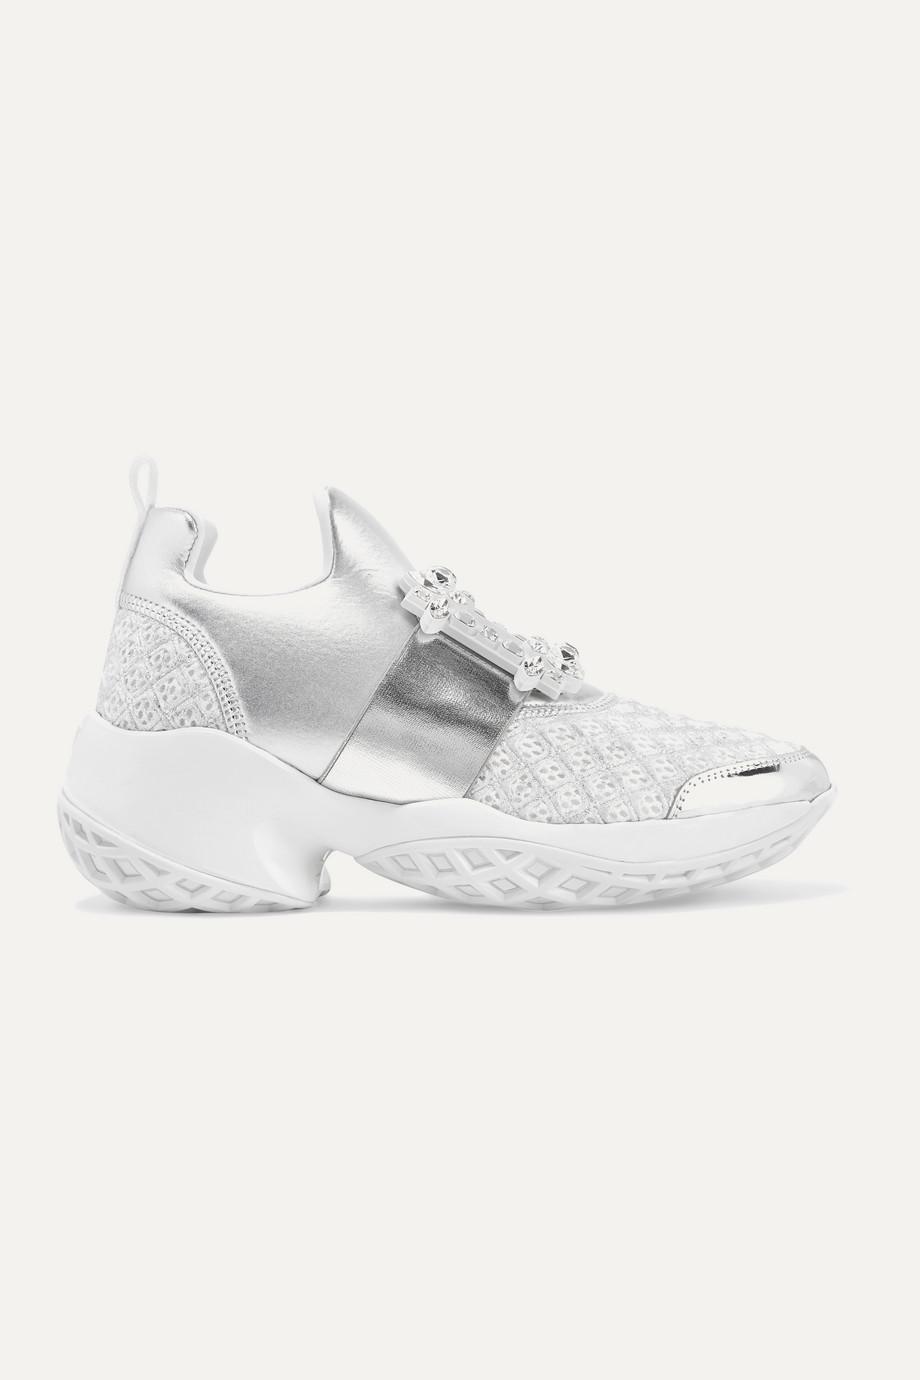 Roger Vivier Viv Run crystal-embellished metallic neoprene, leather and mesh slip-on sneakers